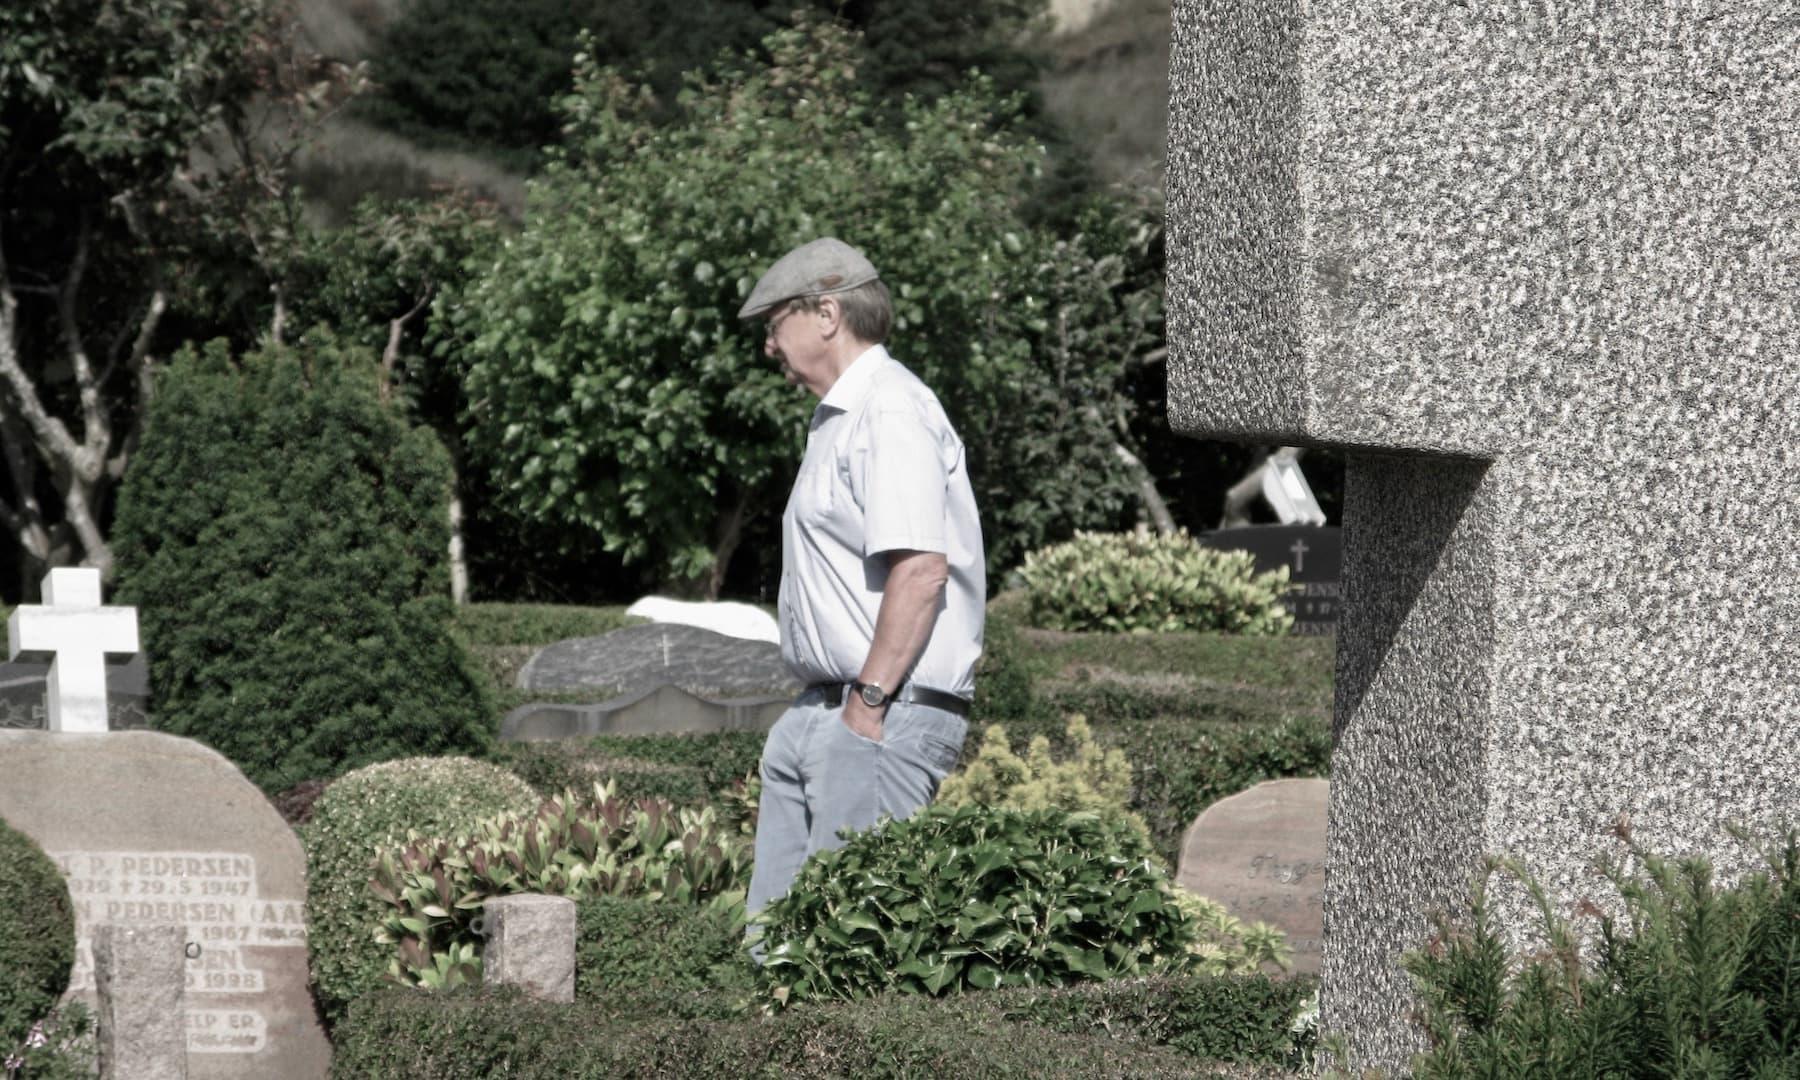 Nørre Lyngvig Kirkegård og Mindekorset